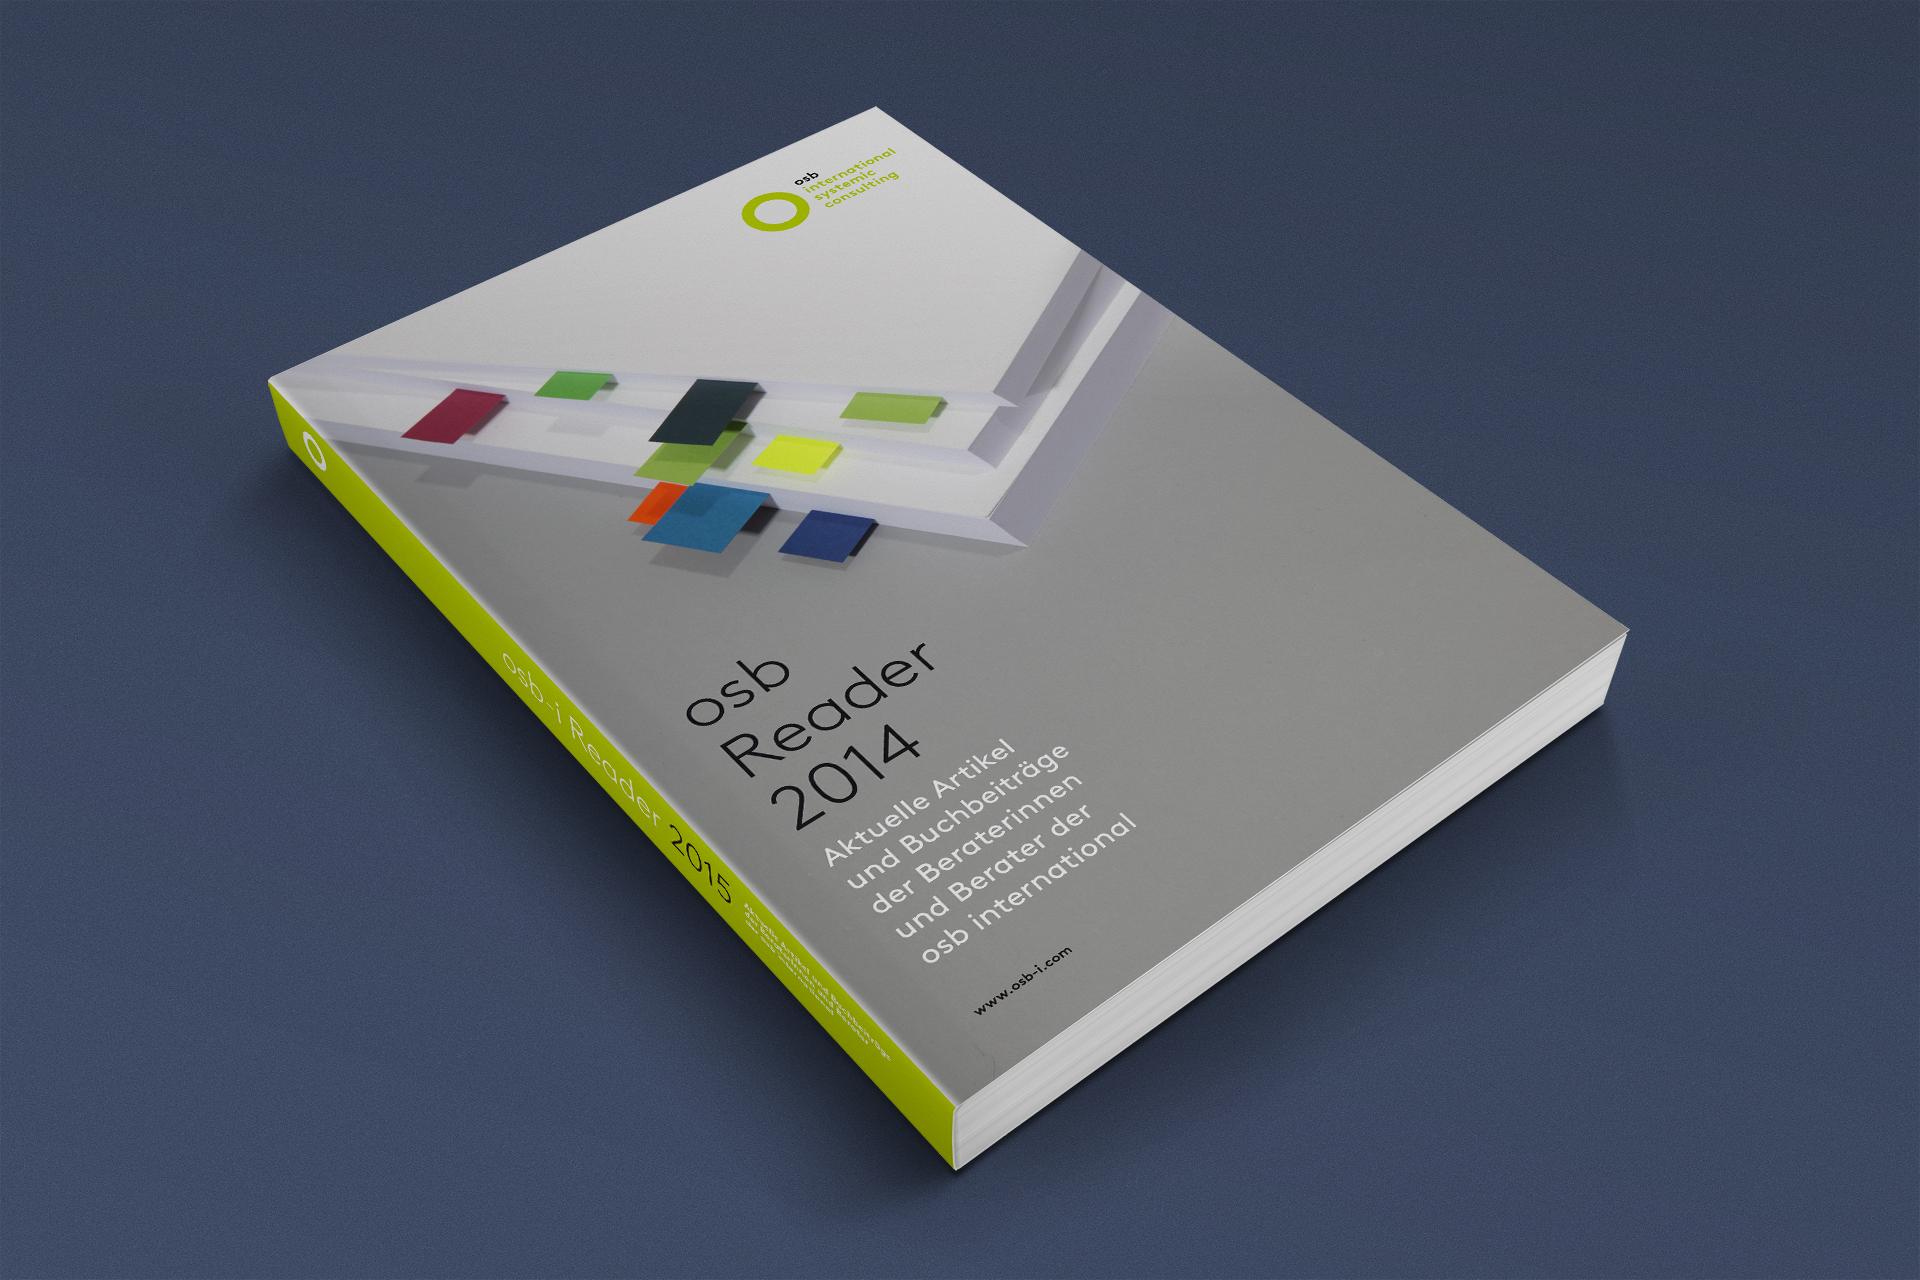 OSB_Reader_Fullscreen_3